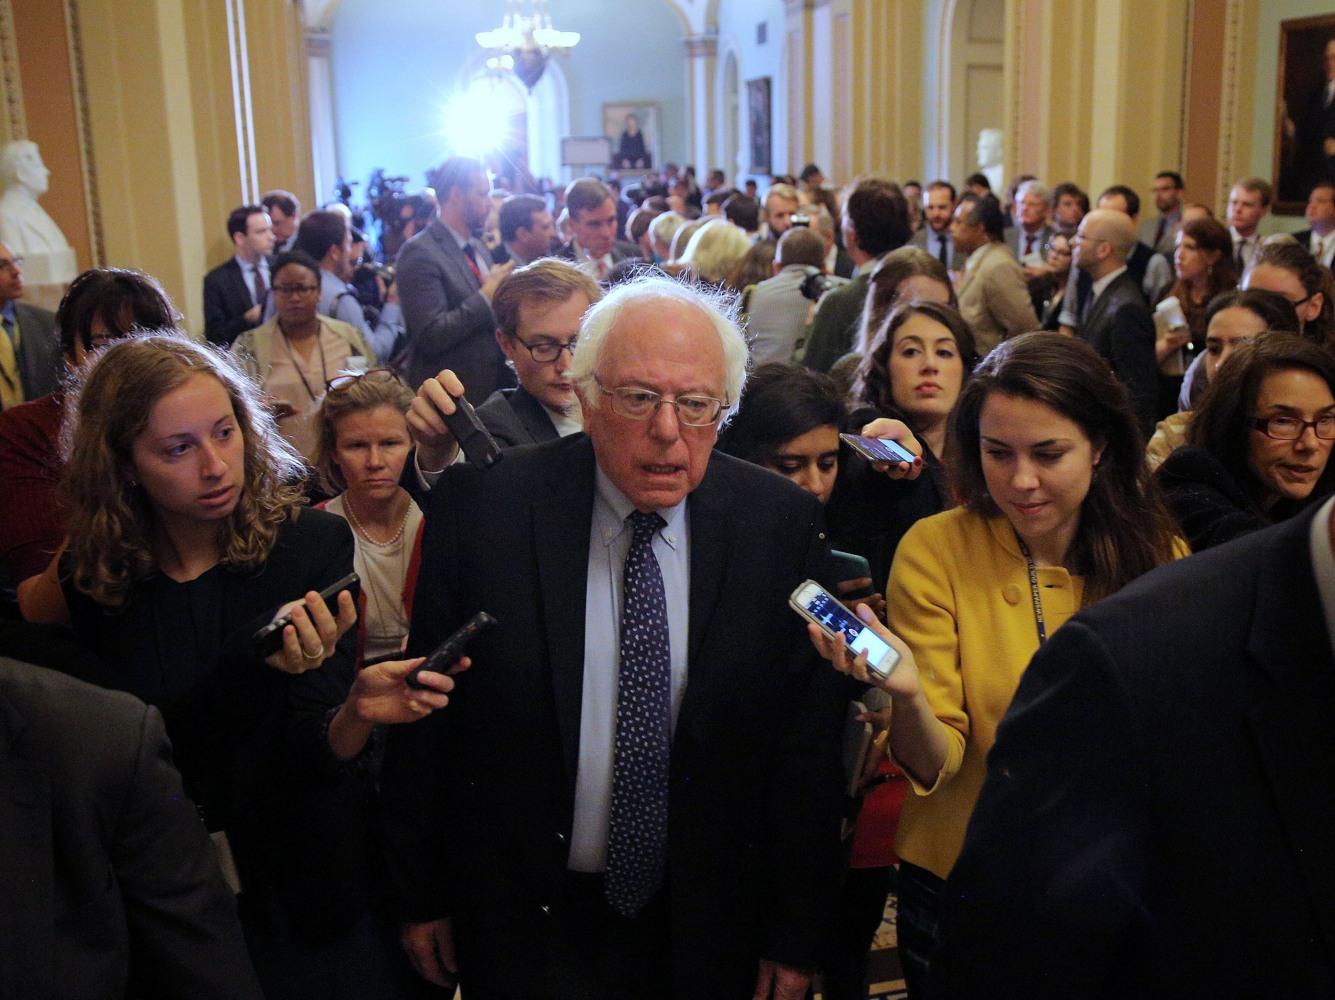 Image U S Senator Bernie Sanders Leaves After Attending The Senate Democrat Party Leadership Elections At